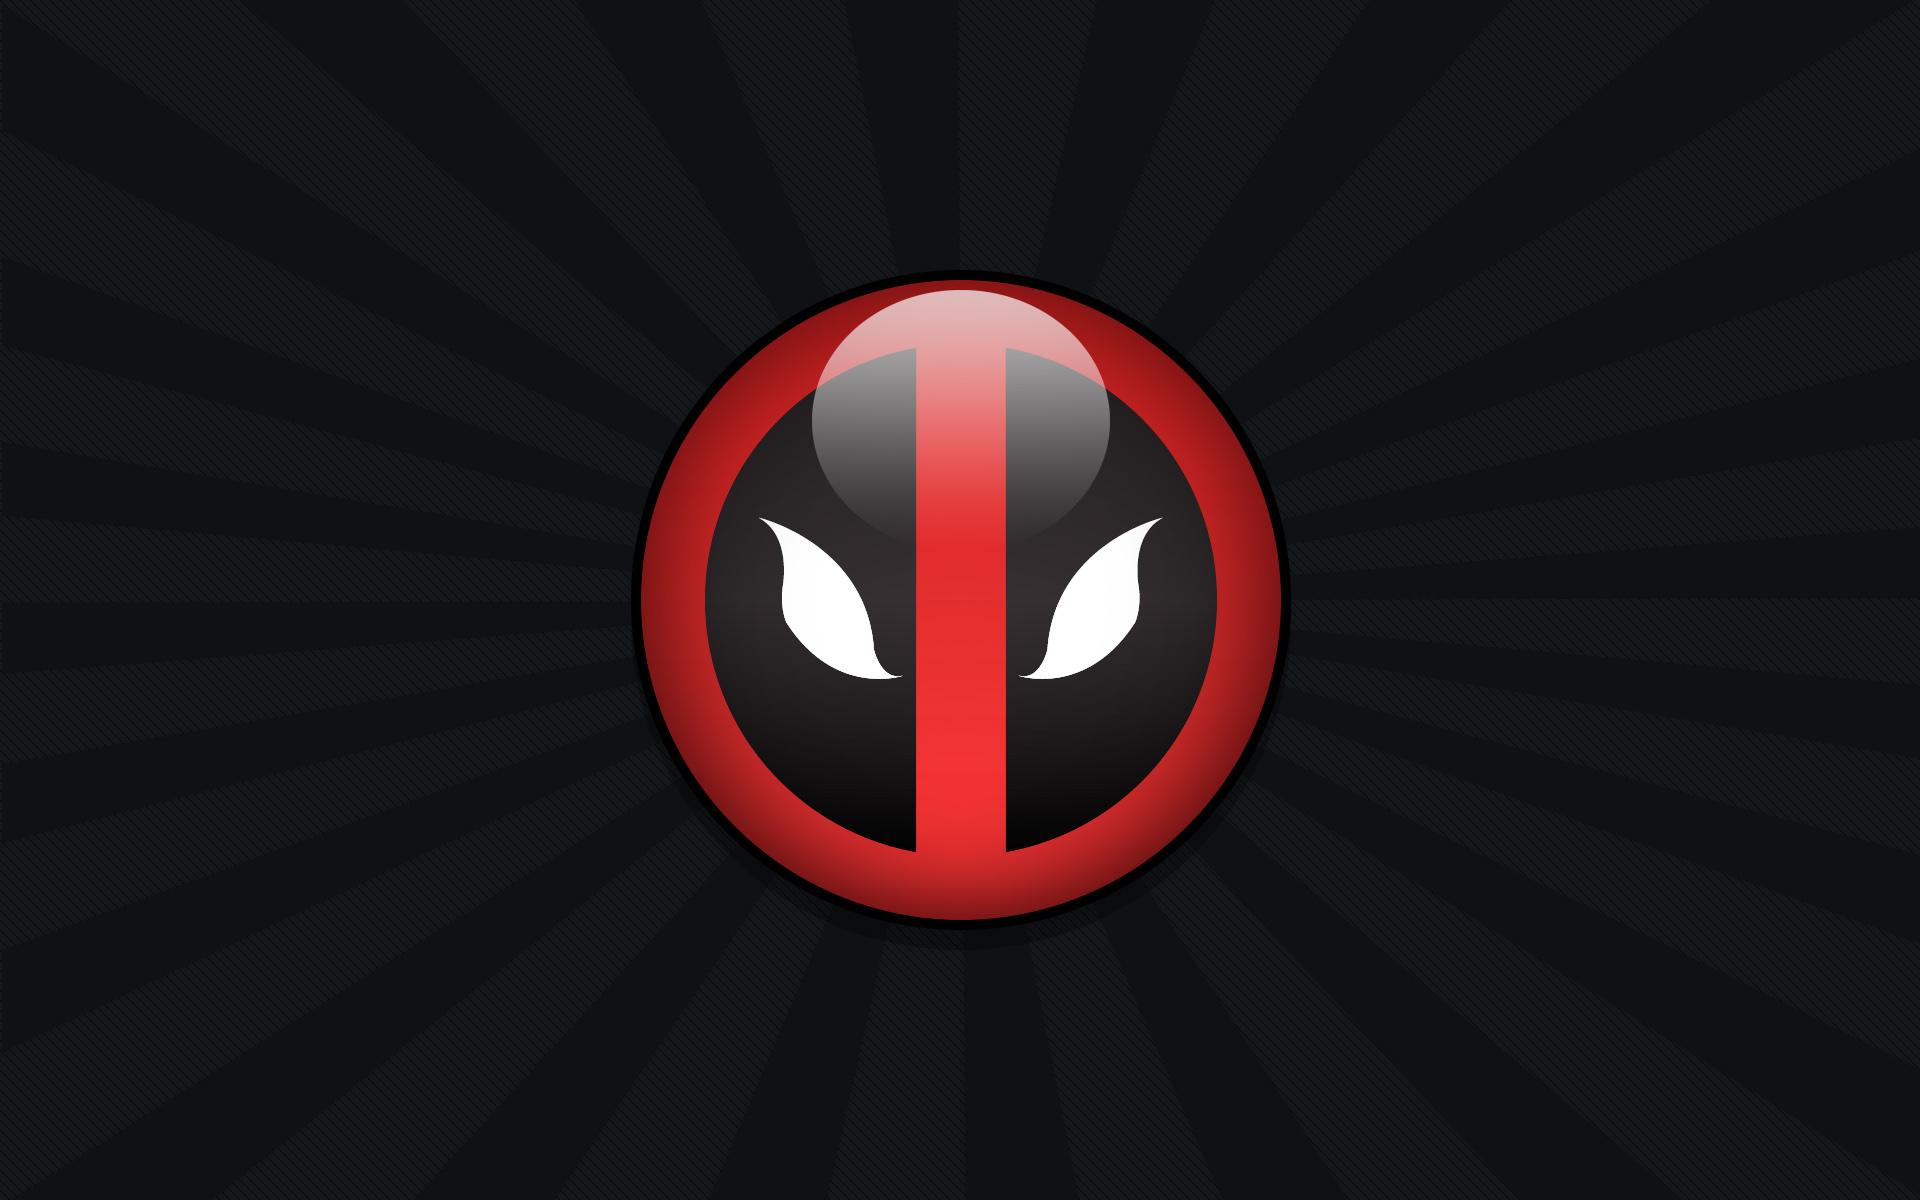 41+] 3D Deadpool Logo Wallpaper on WallpaperSafari.